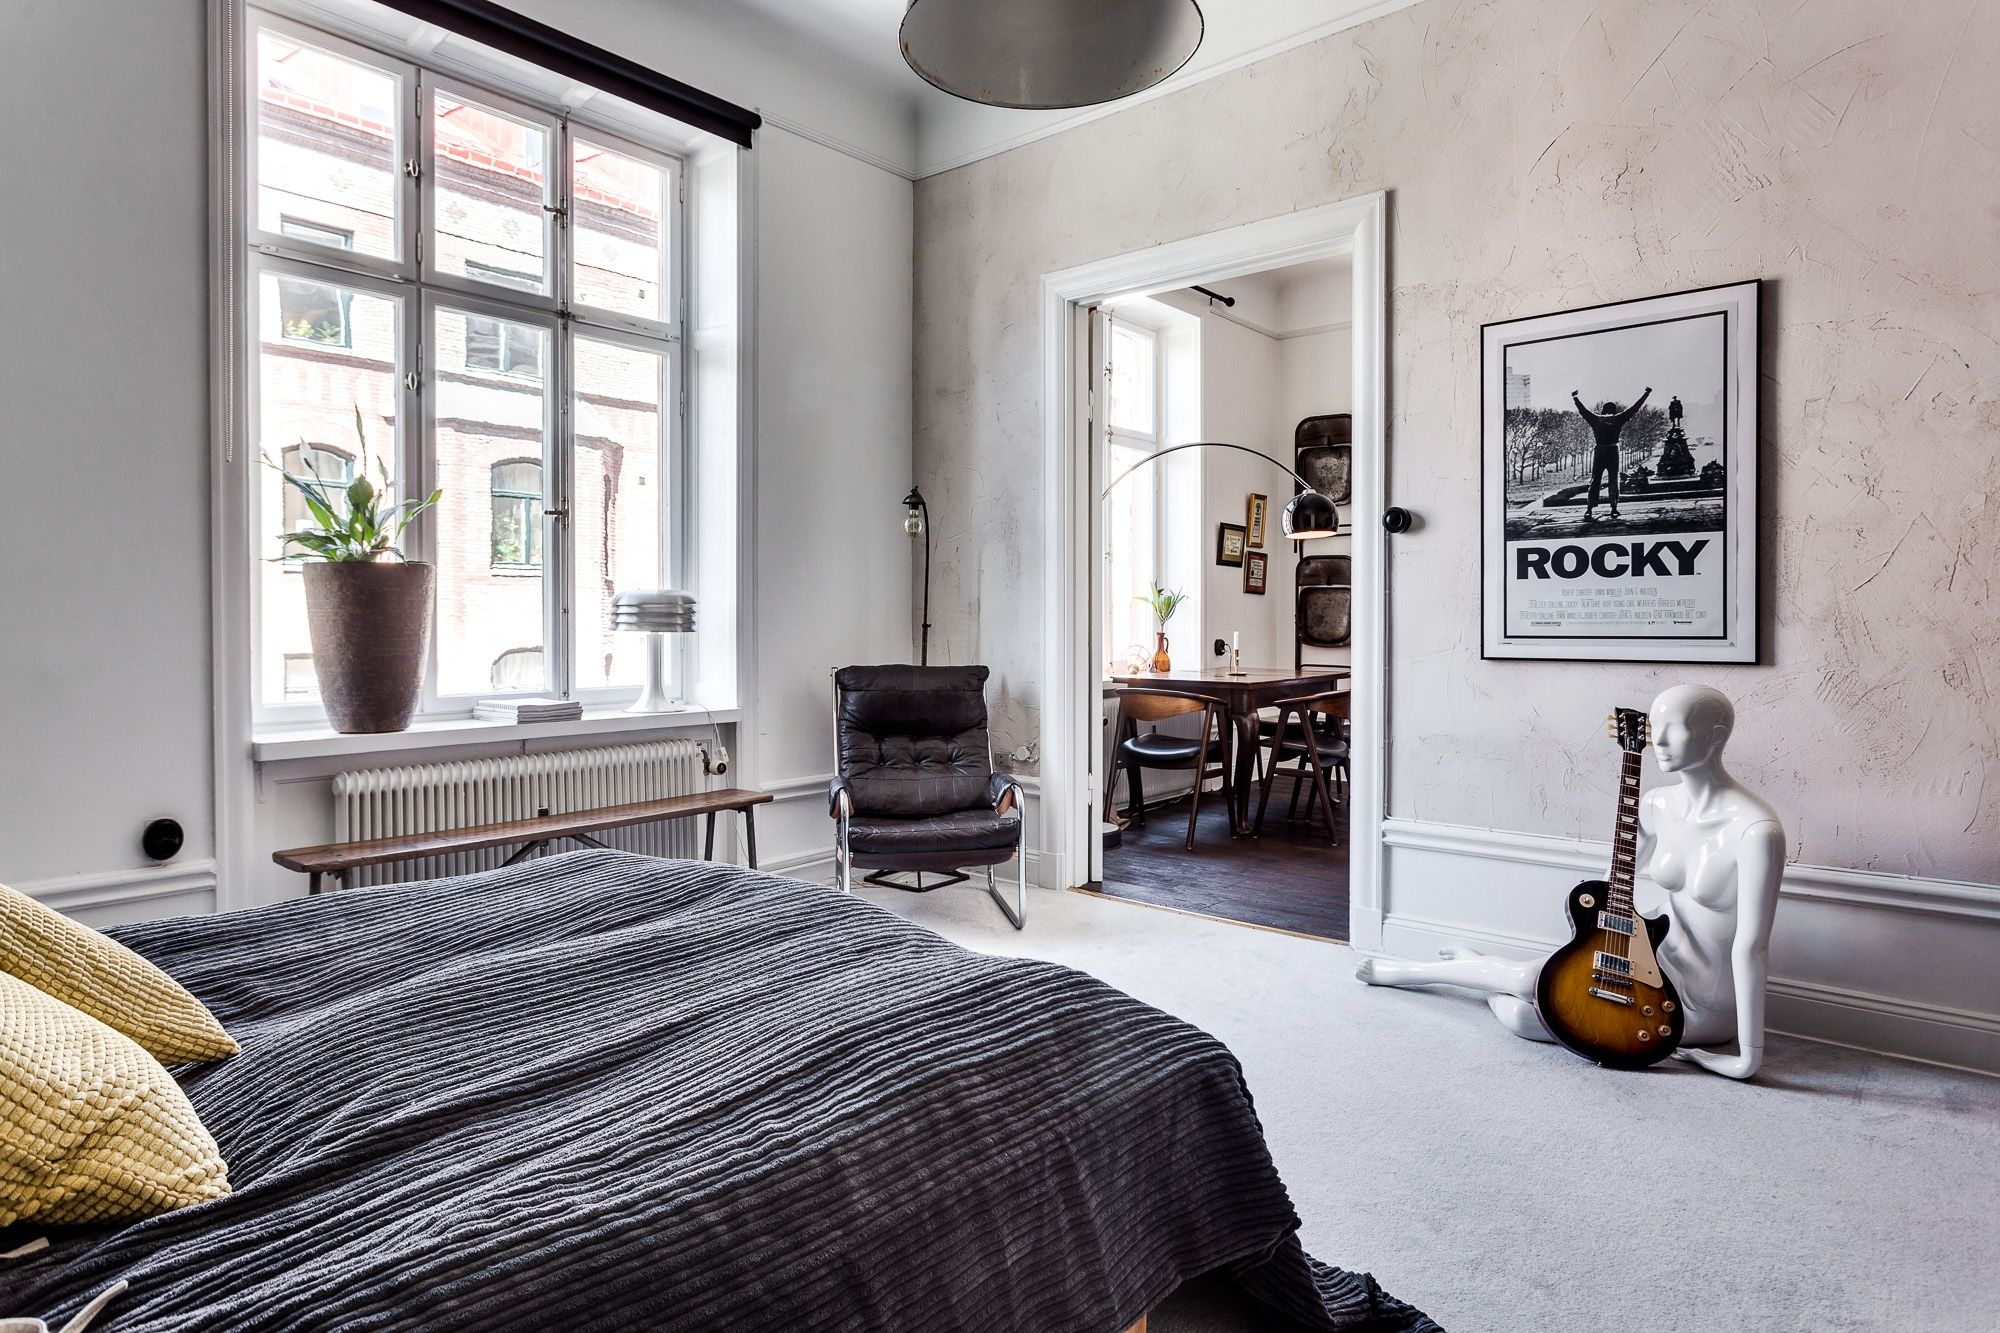 Leuke Slaapkamer Decoraties : In deze vintage slaapkamer vind je hele leuke en inspirerende